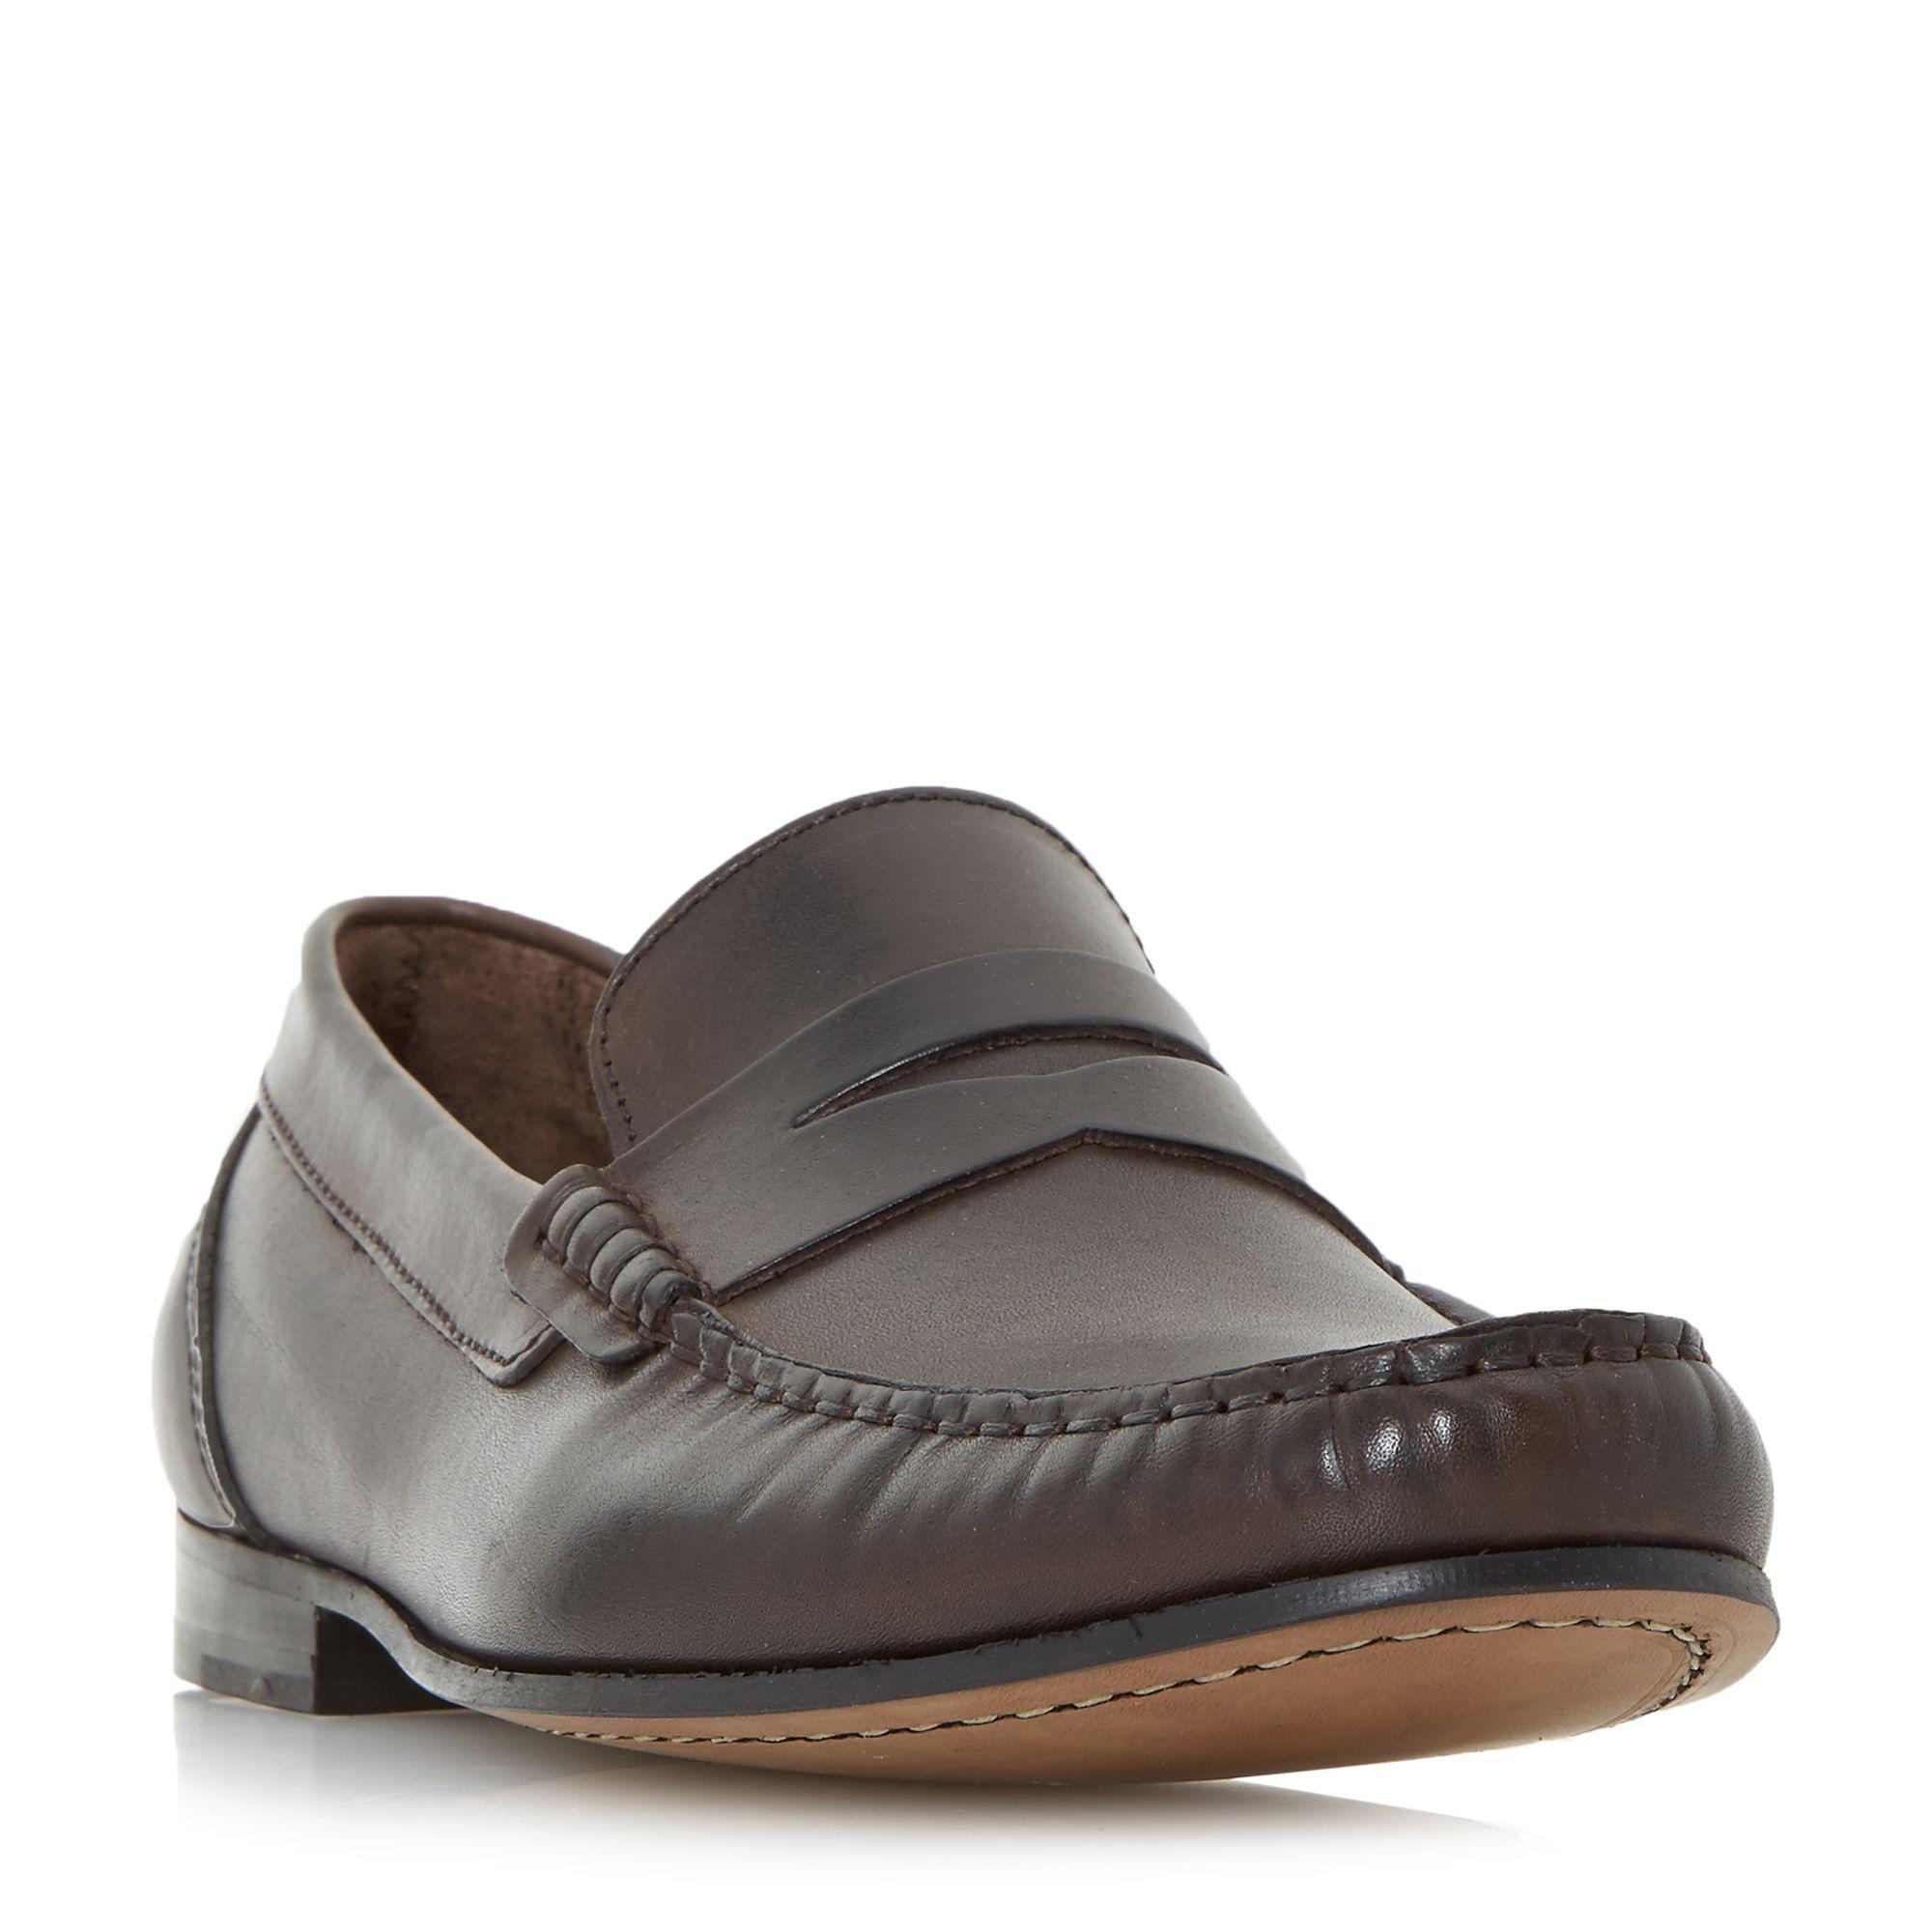 Bertie Shoes Online Shop